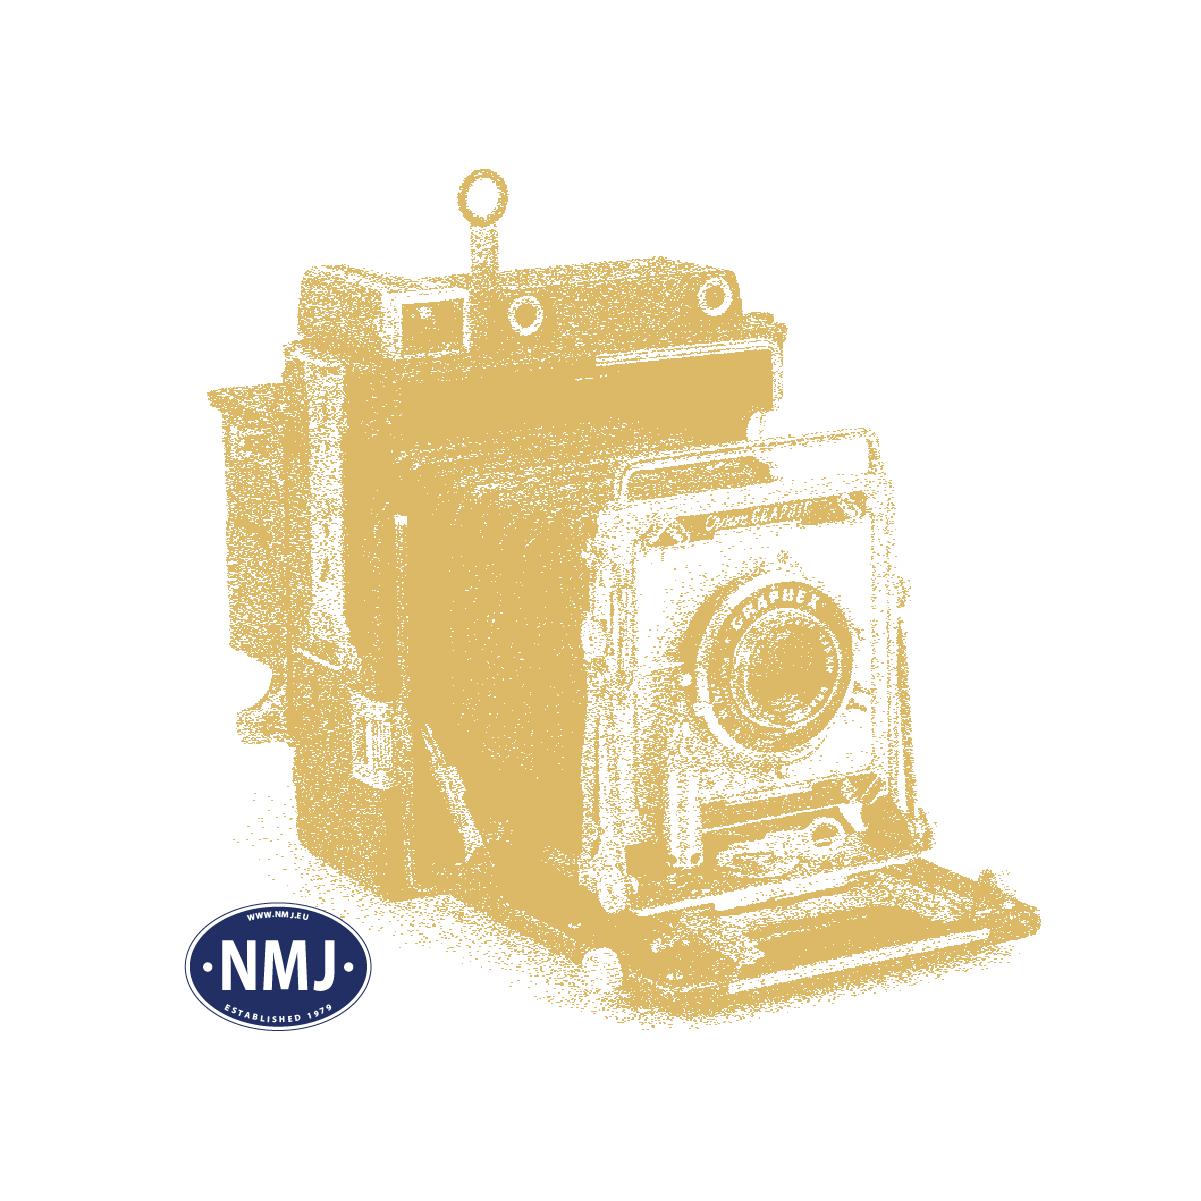 NMJT113.401 - NMJ Topline NSB CB1 21219, Red/Silver/Grey